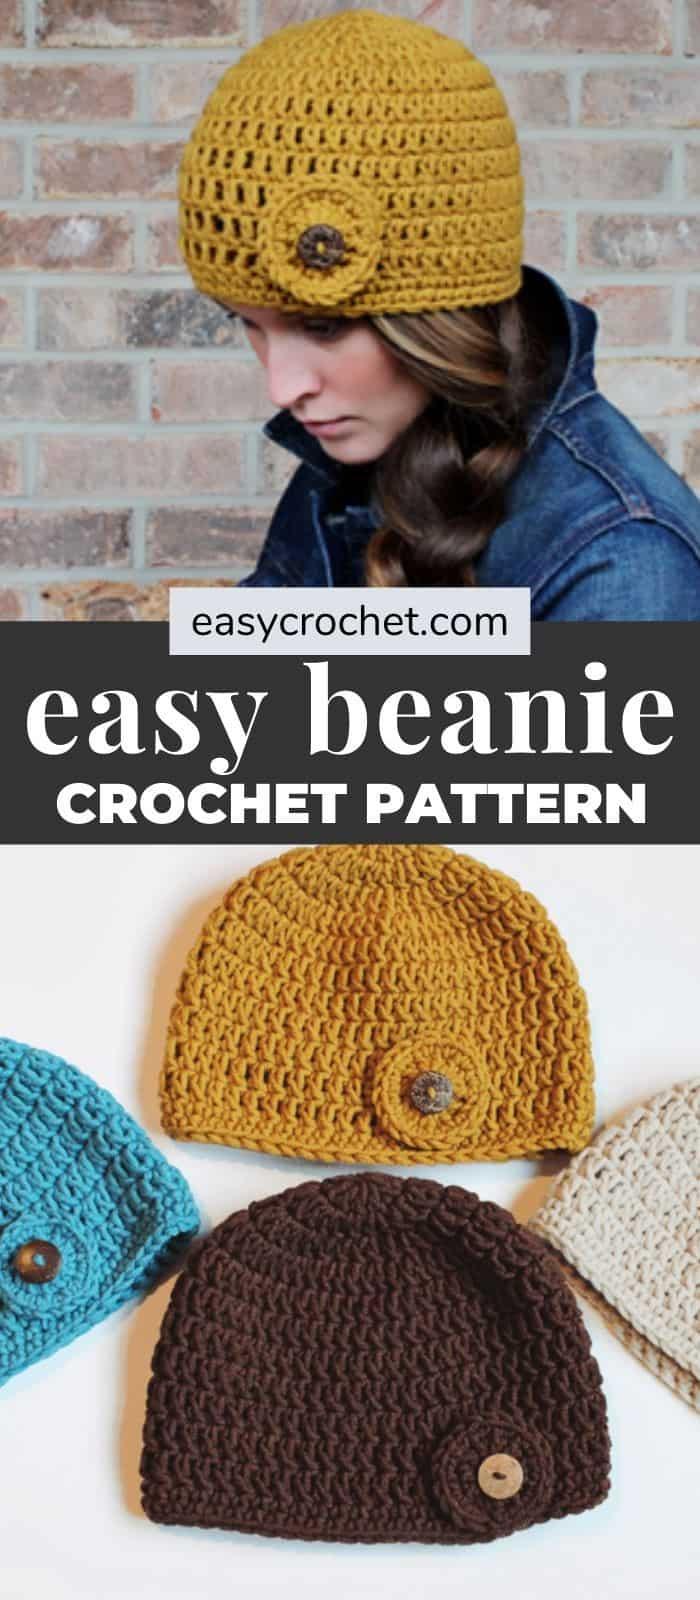 Free Crochet Hat Pattern for Women using only the double crochet from Easy Crochet via @easycrochetcom